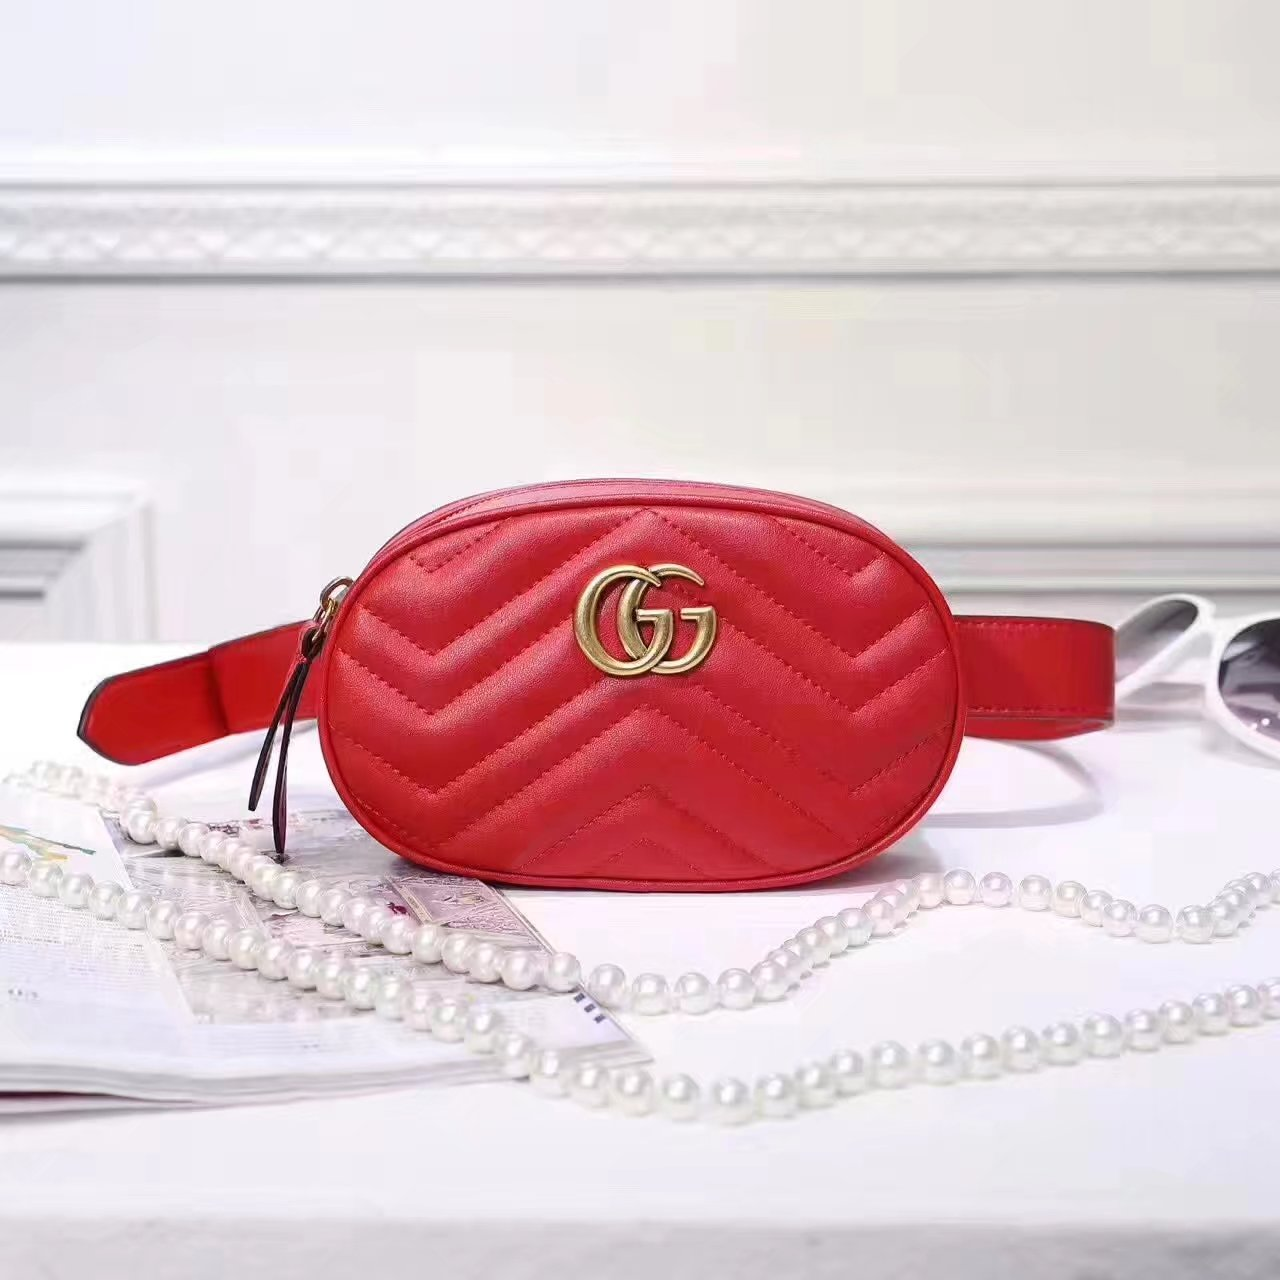 Gucci 476434 GG Marmont Matelassé Leather Belt Bag Red